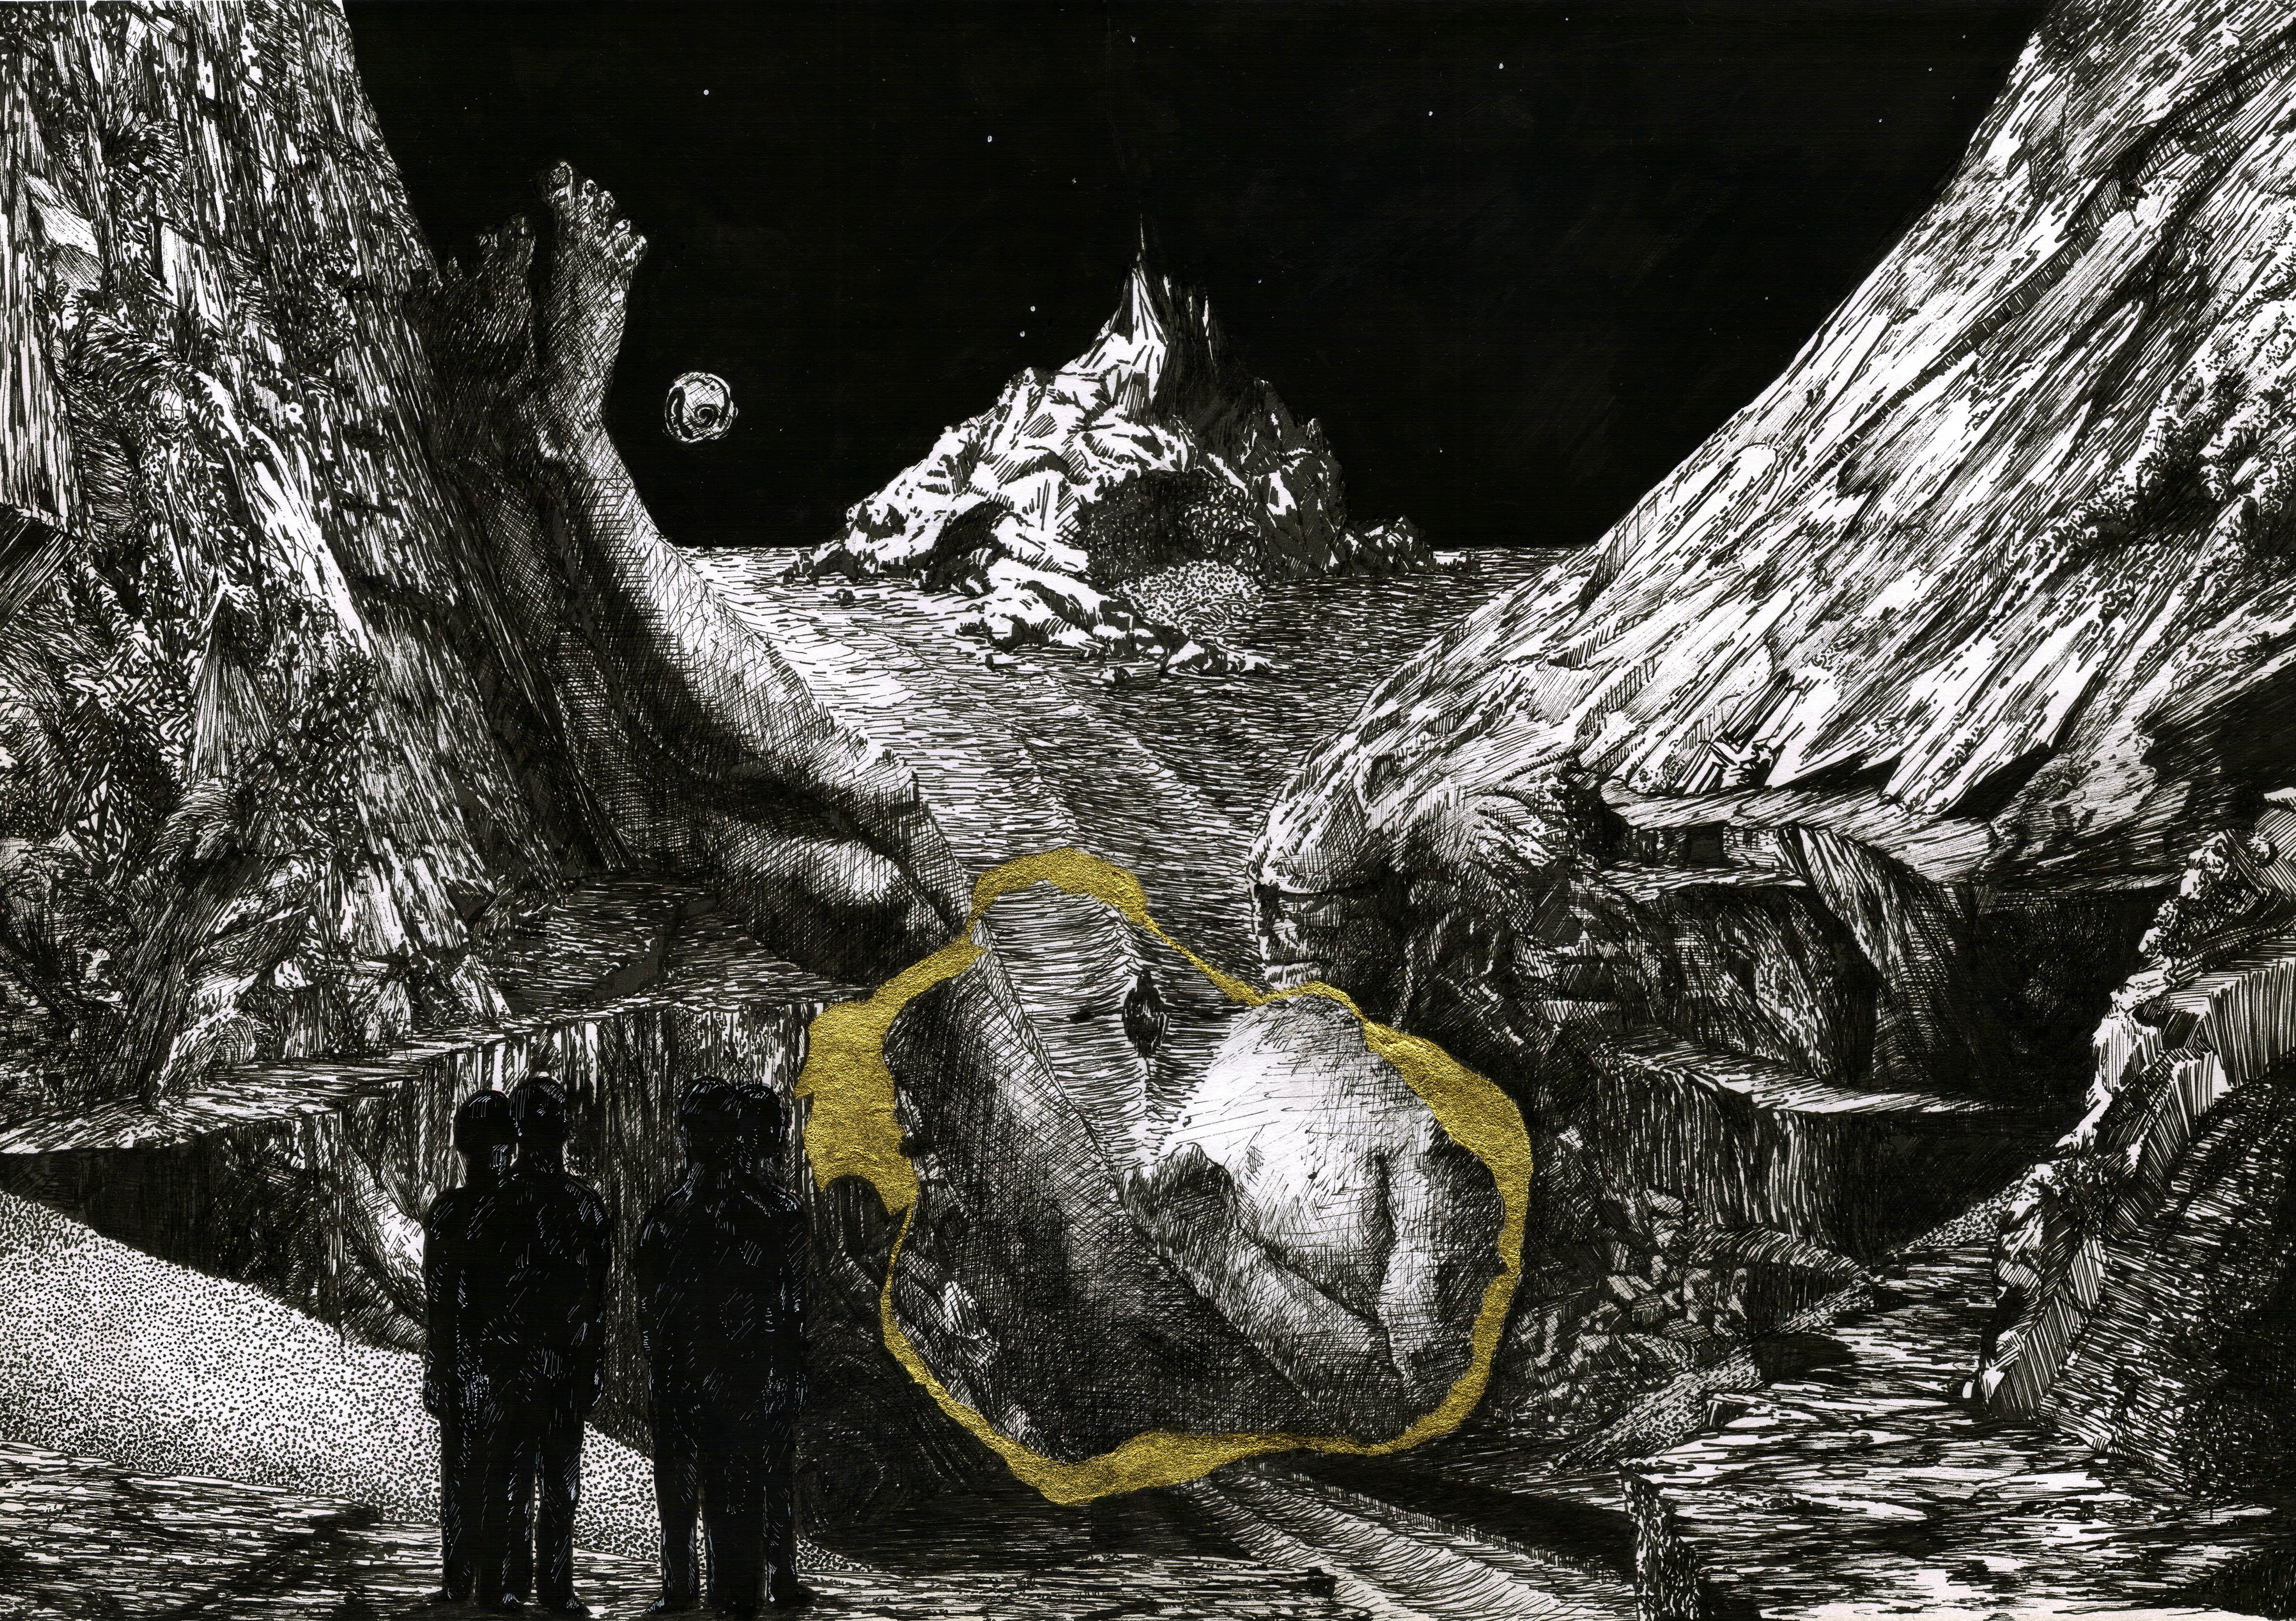 Myth, fantasy art drawing by Kostas Gogas